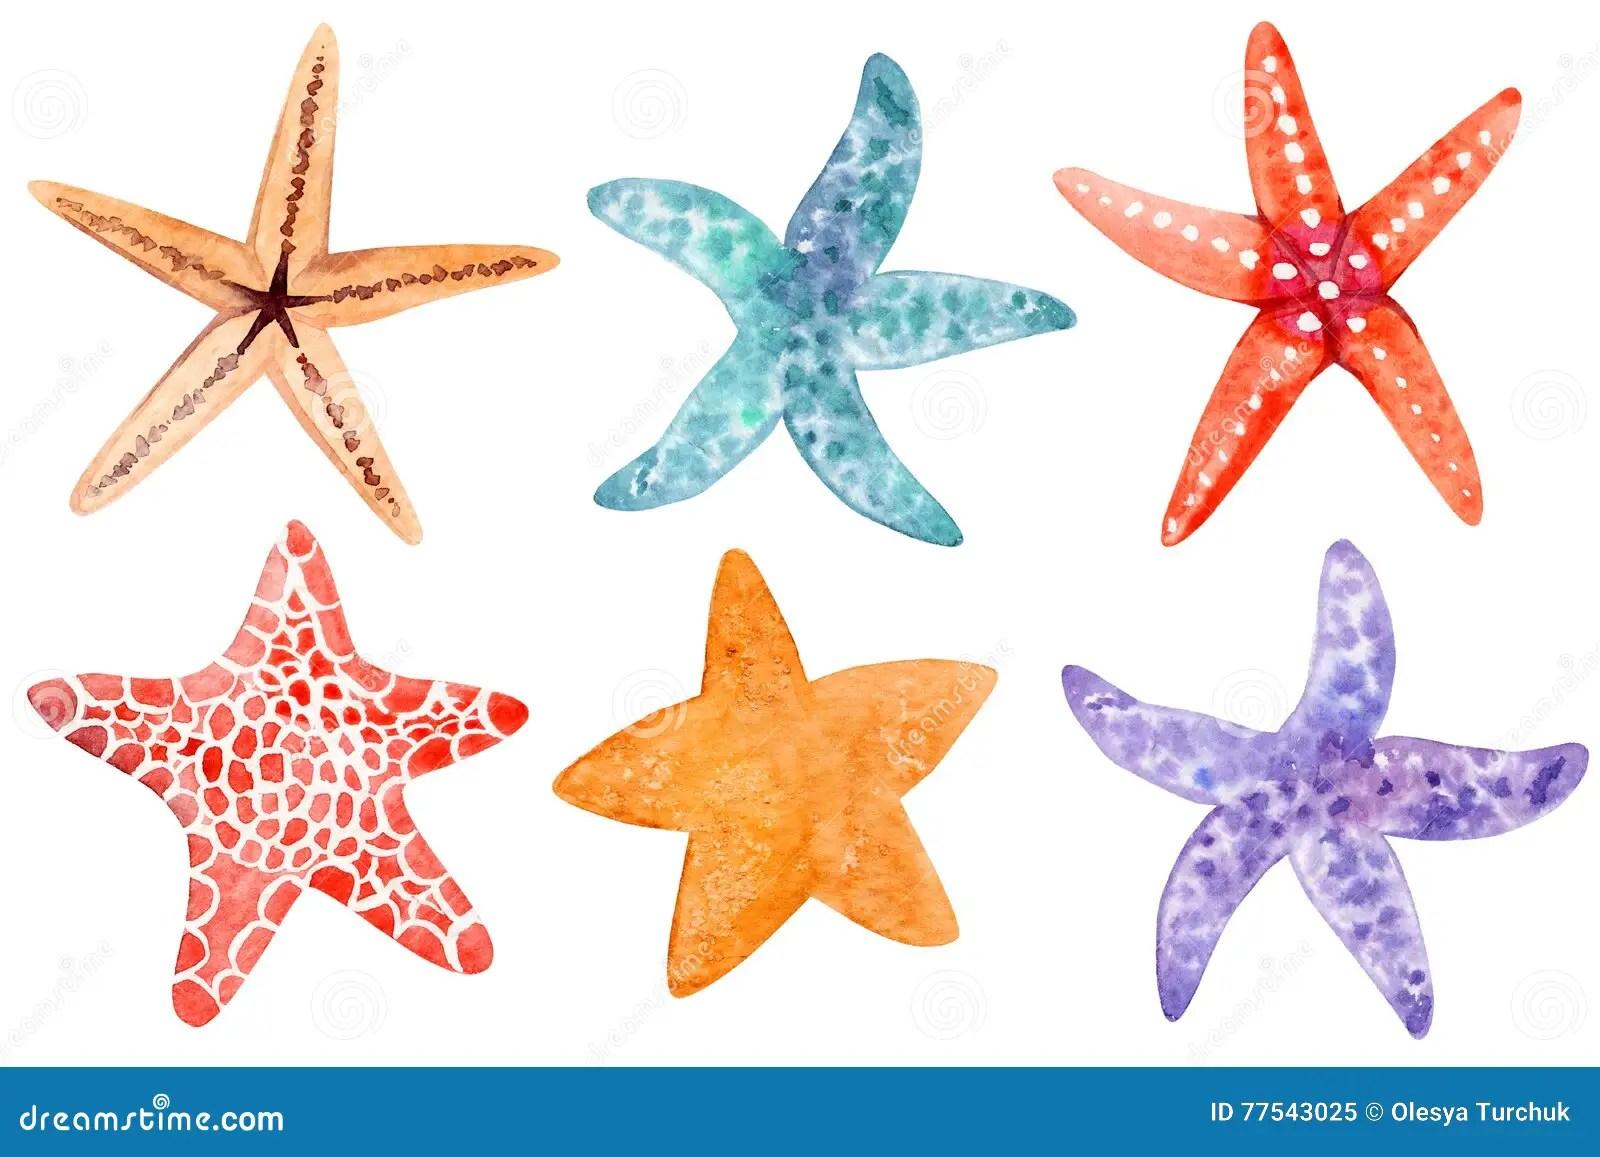 hight resolution of set of starfish clipart stock illustration illustration of hand rh dreamstime com starfish clip art free starfish clipart png